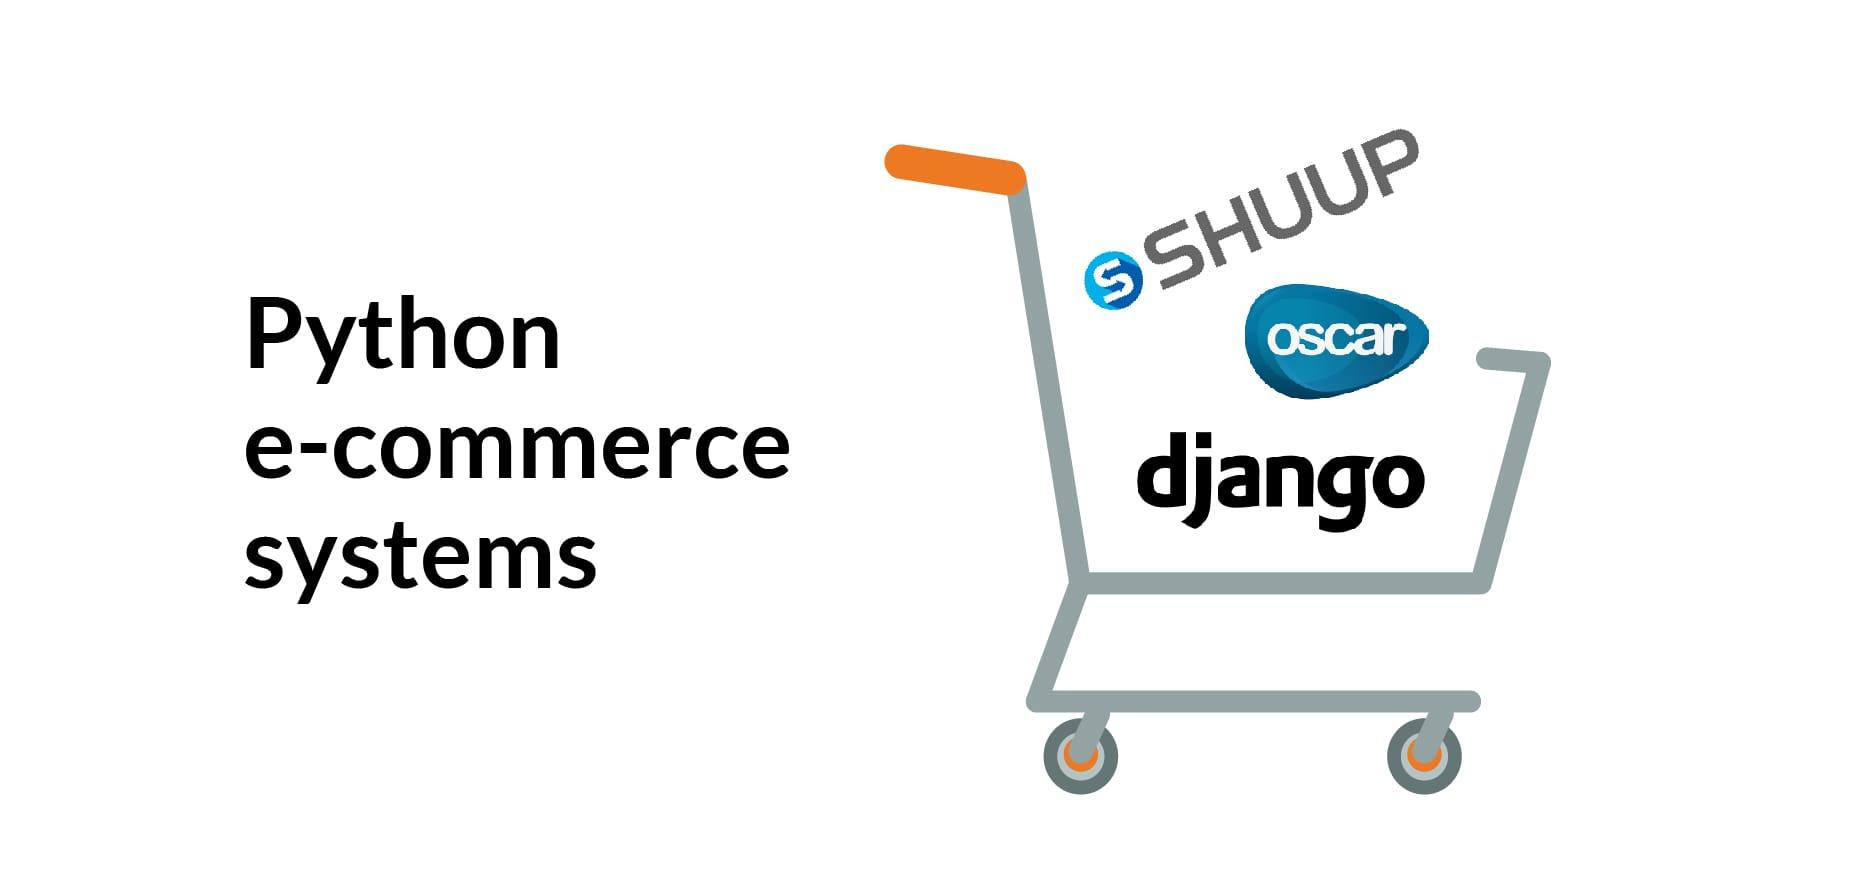 Python e-commerce systems